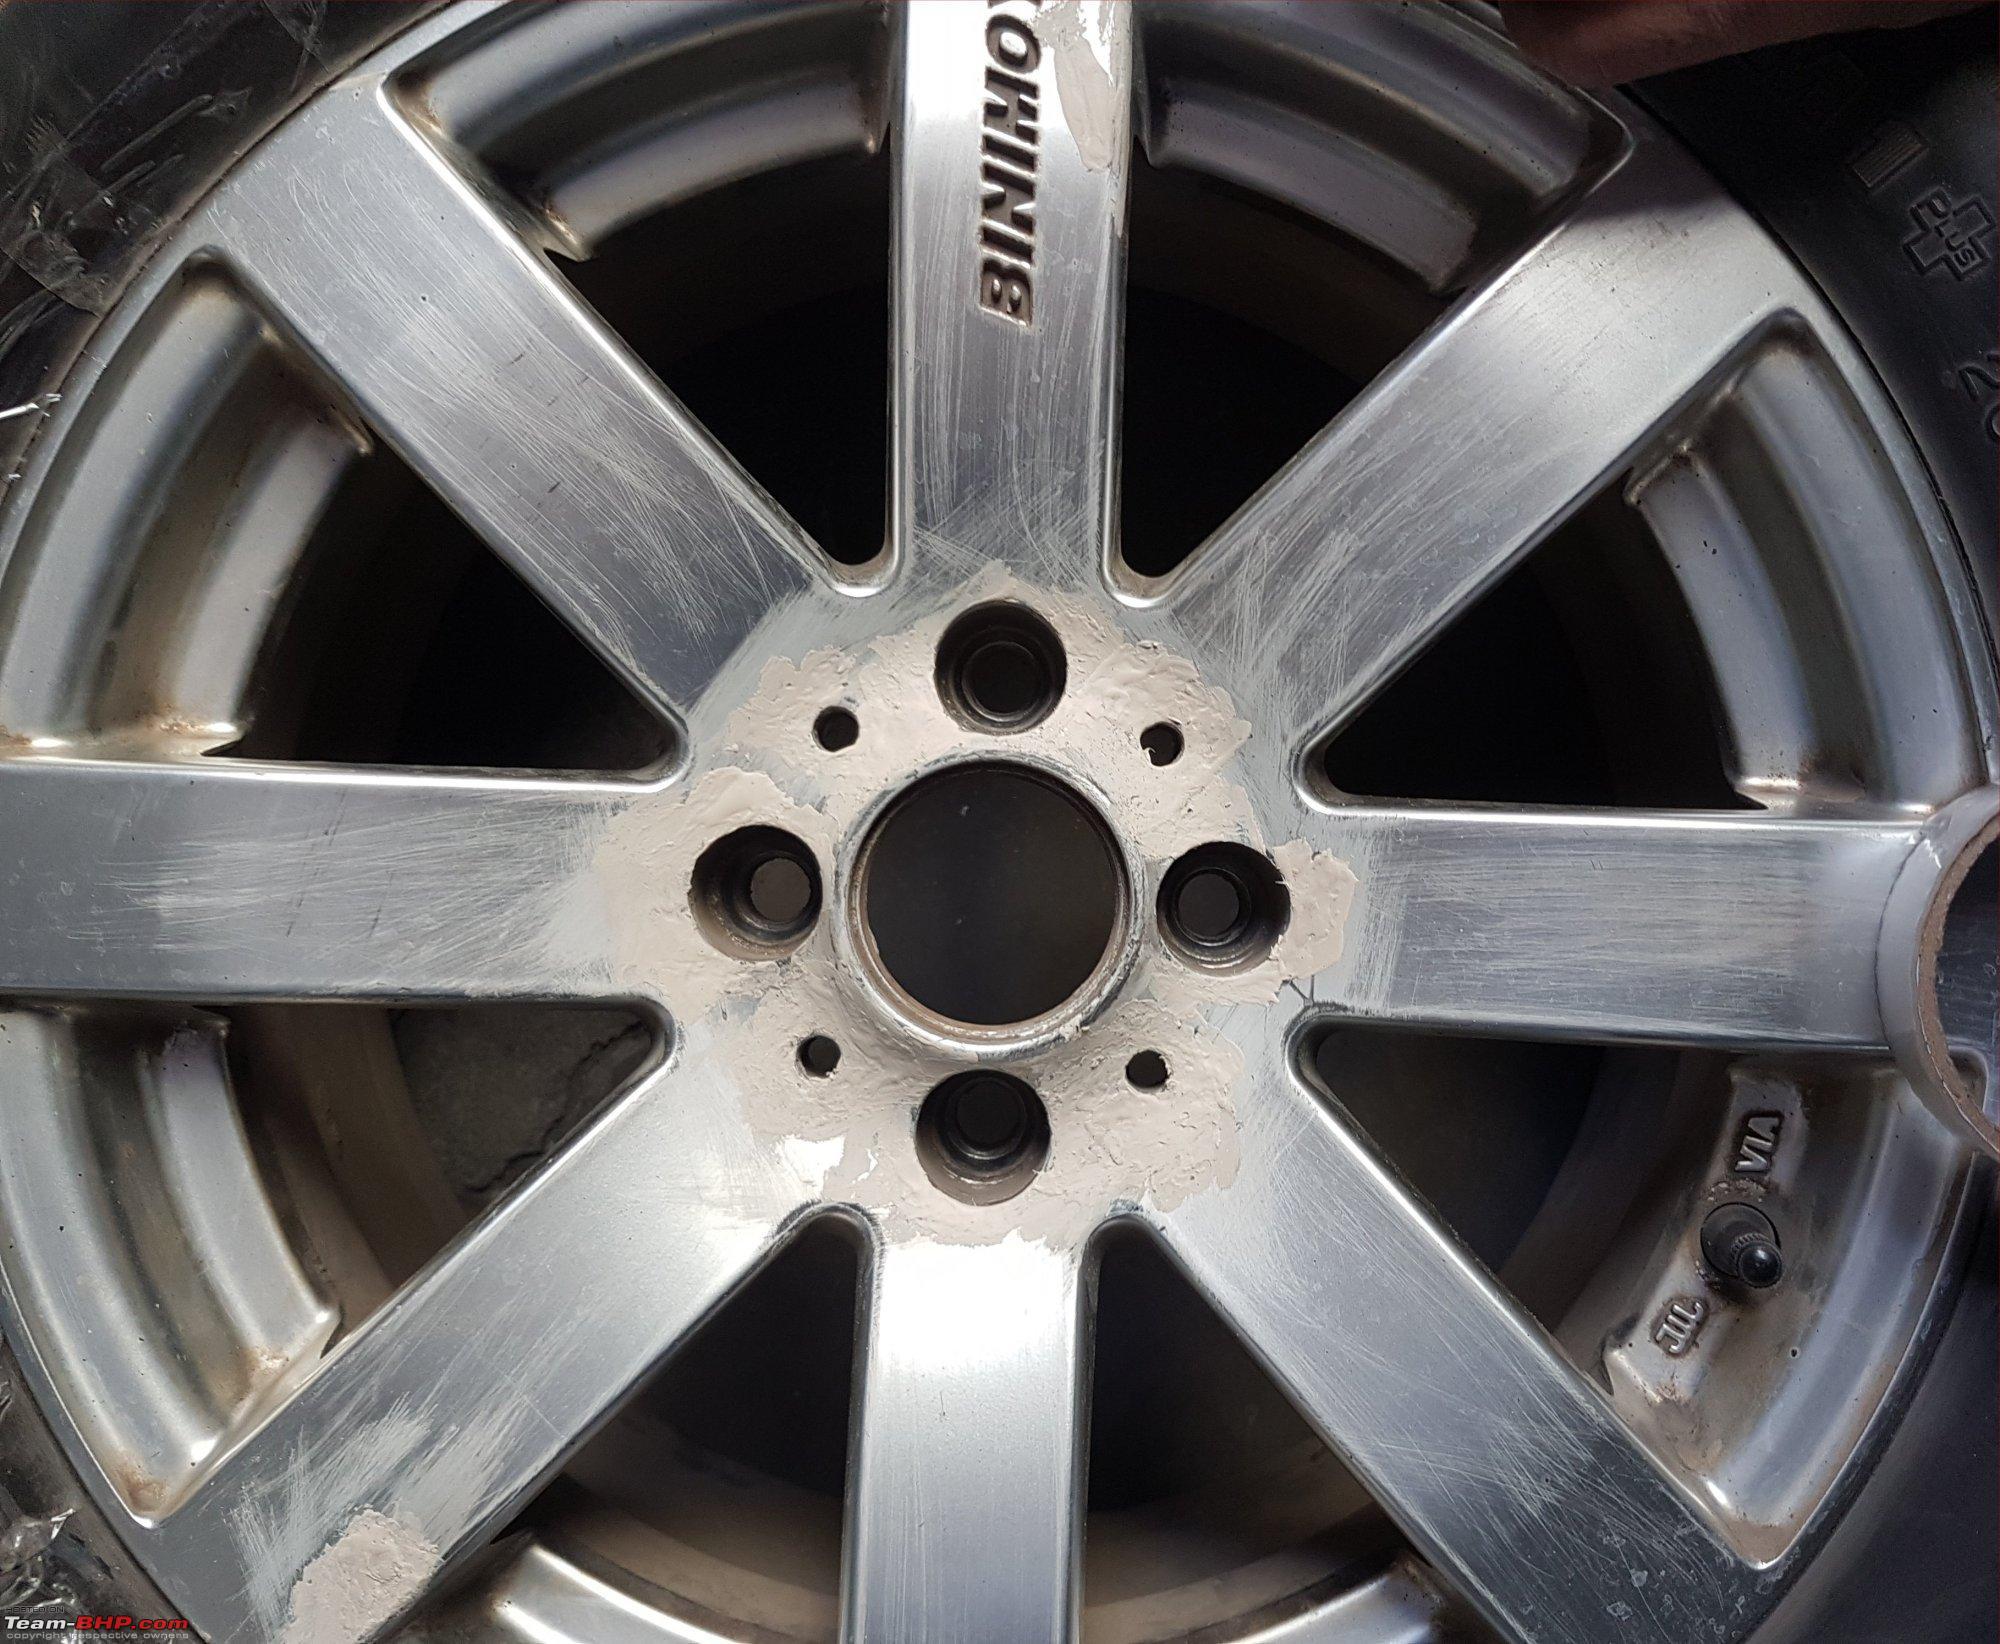 Diy painting alloy wheels with spray cans team bhp diy painting alloy wheels with spray cans filledg solutioingenieria Choice Image